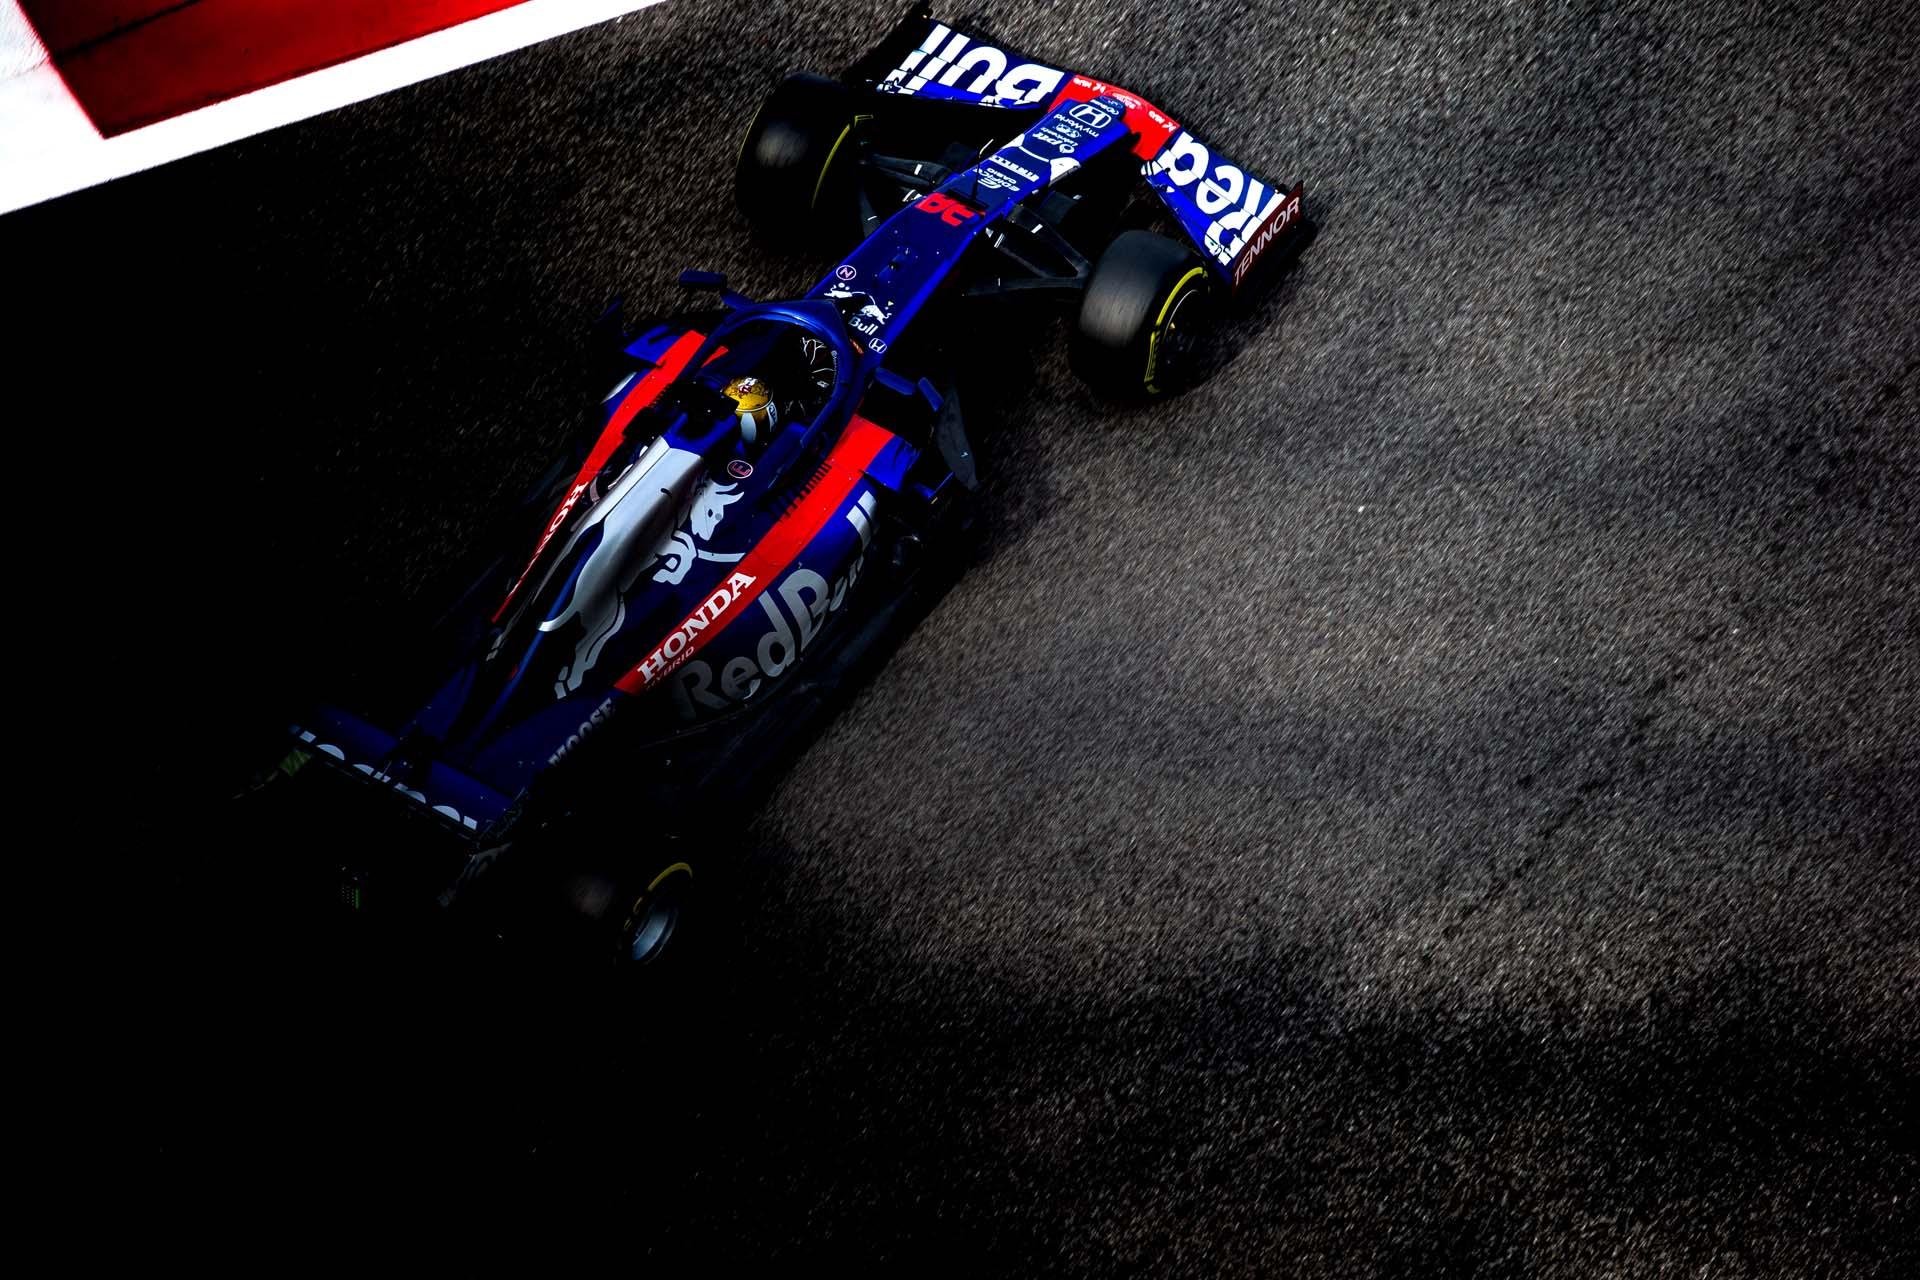 F1 End of Season Testing in Abu Dhabi - Day One